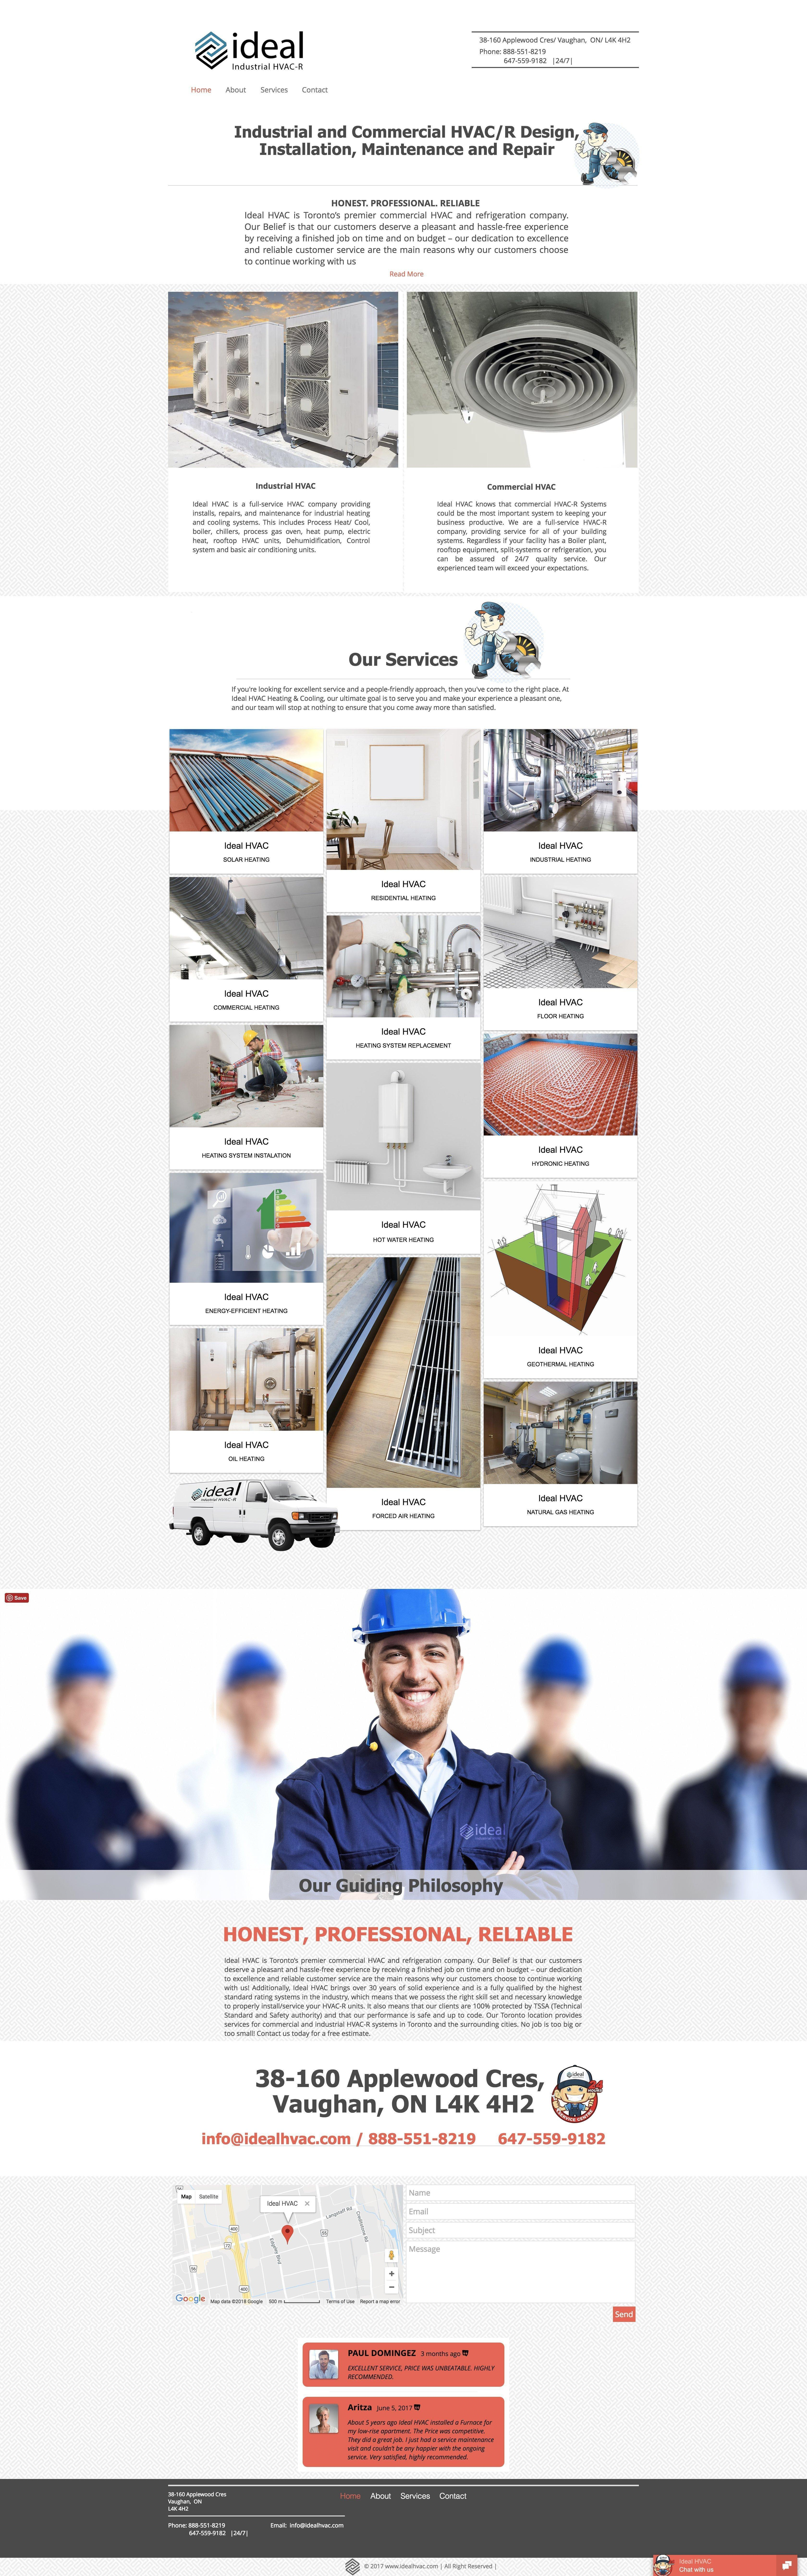 Ideal HVAC Web design- PIC2MOTION